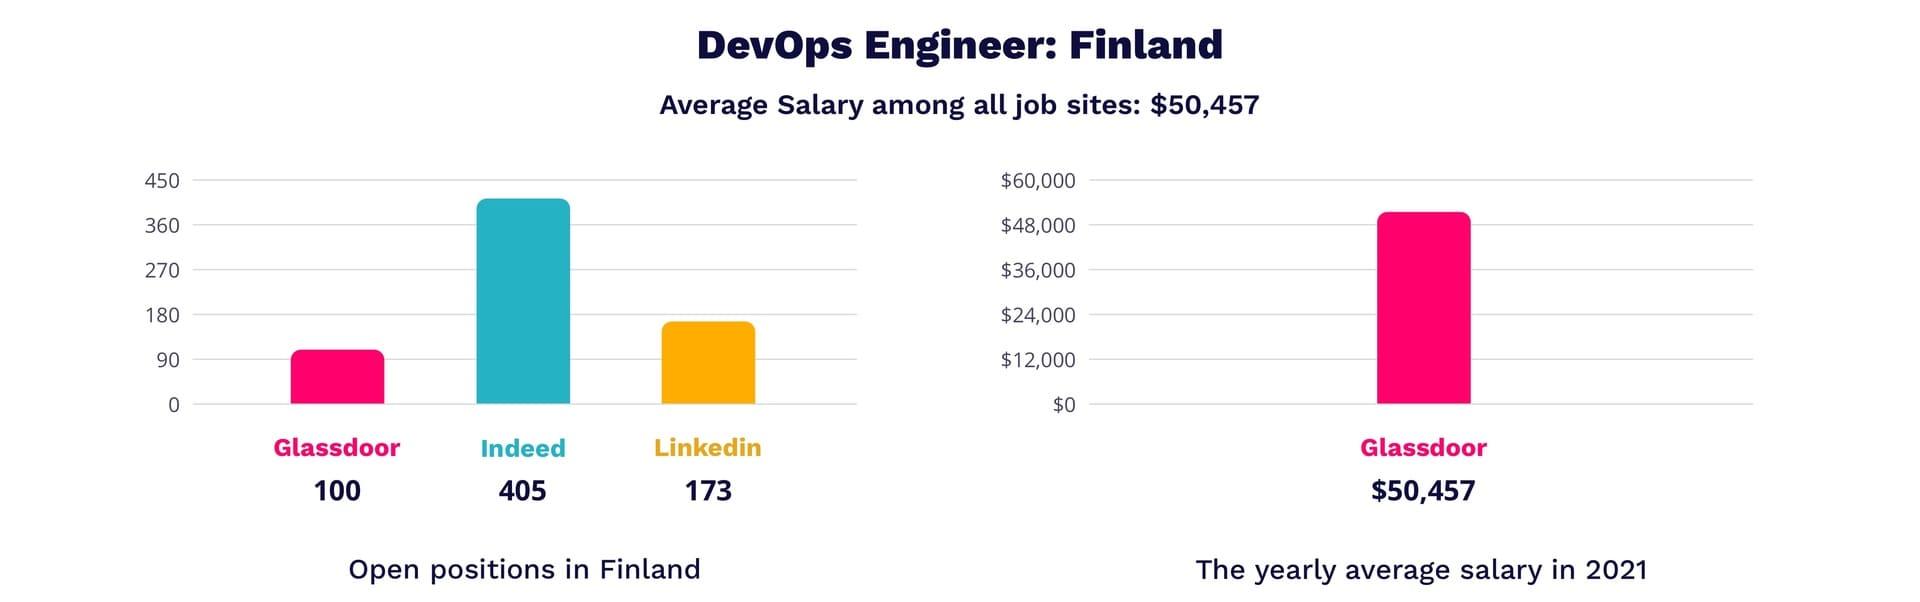 DevOps engineer salary in Finland